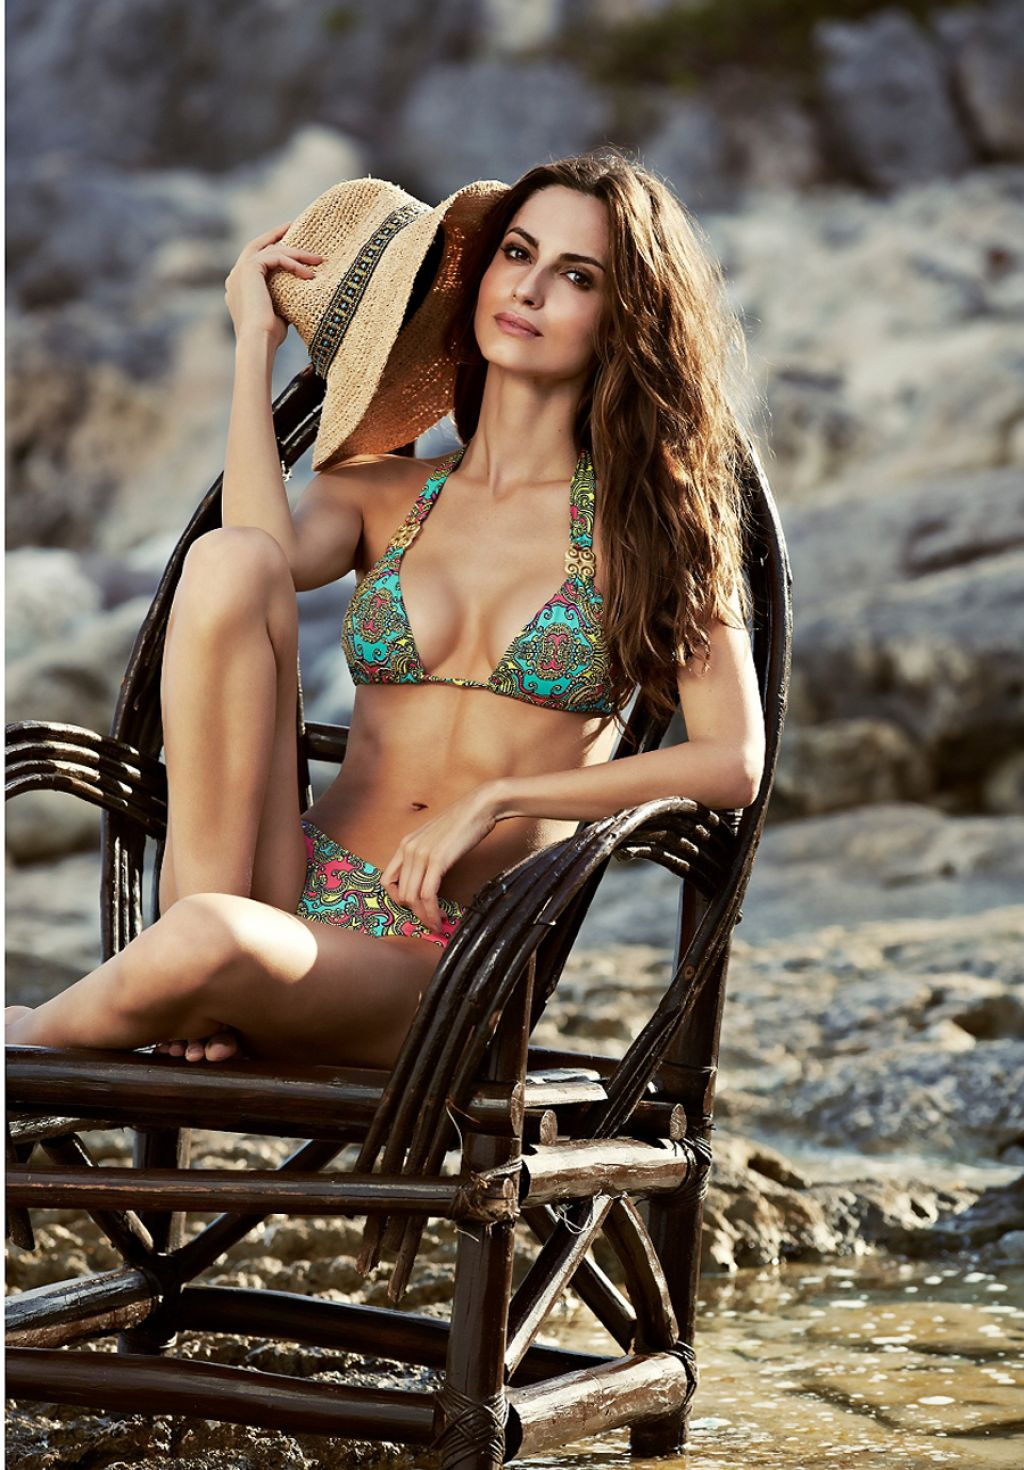 Ariadne Artiles Ondademar Swimwear 2014